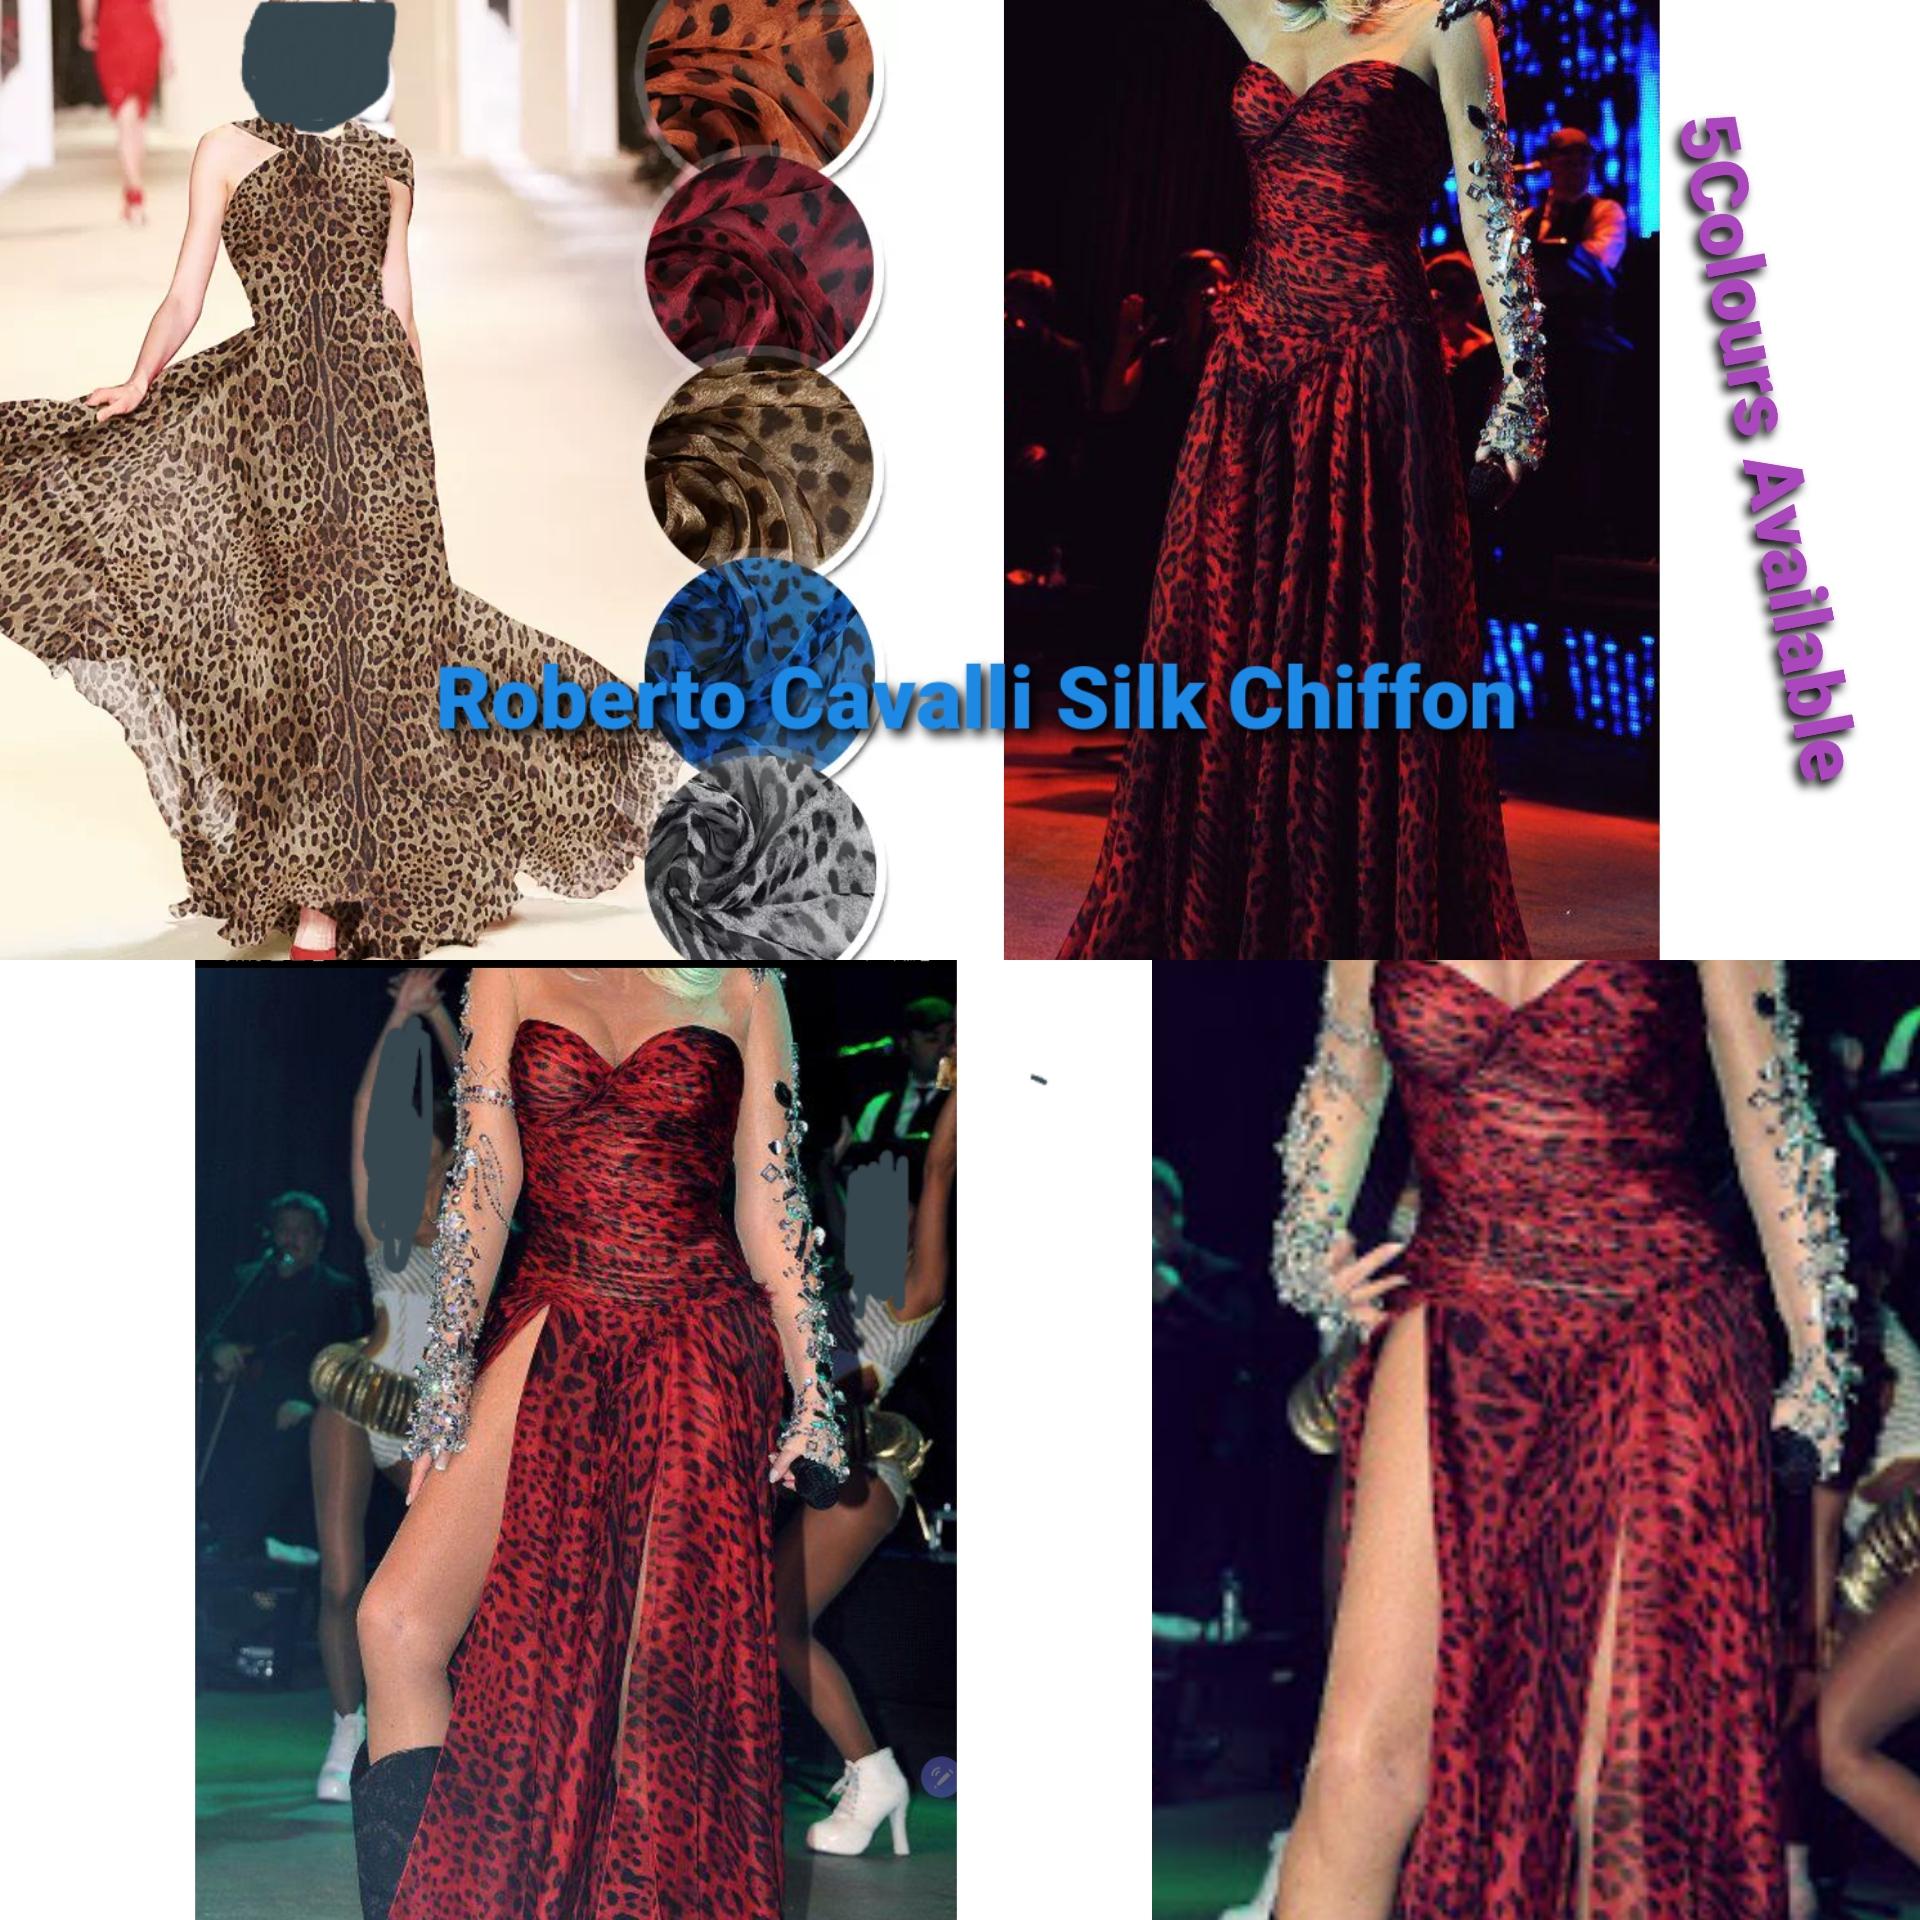 Roberto Cavalli Italian Designer Silk Chiffon Leopard Print Orange With Black Couture Fashion Week Fabric Check Shop For All Type Of Fabric Pure Silk Leopard Print Fabric Rozitta Rapetti